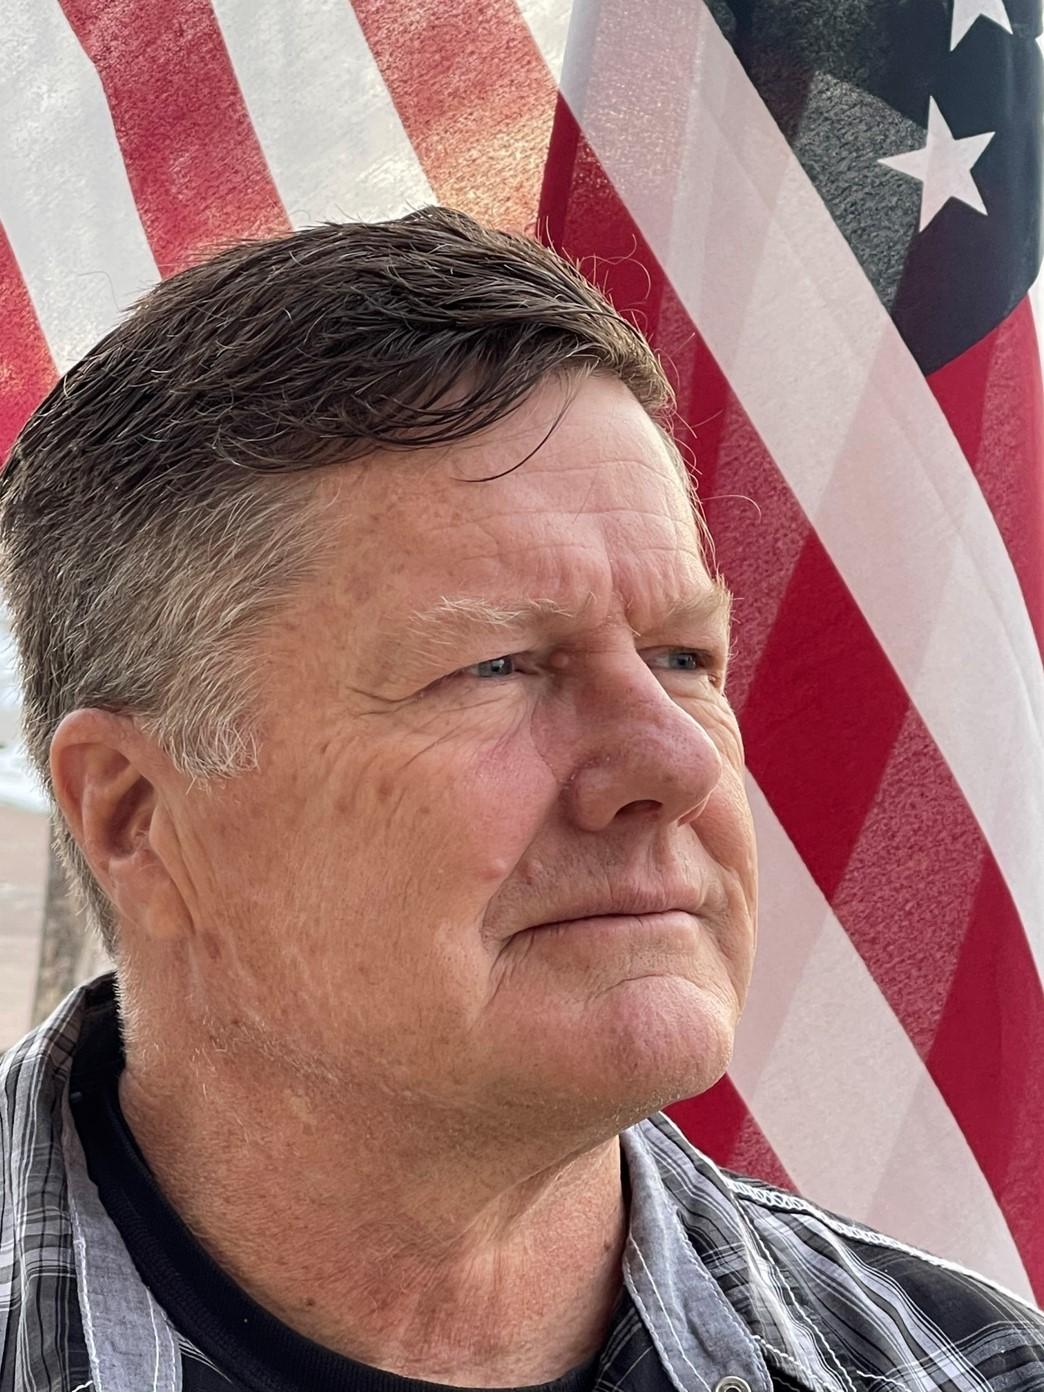 Jay Inman for Colorado Springs City Council